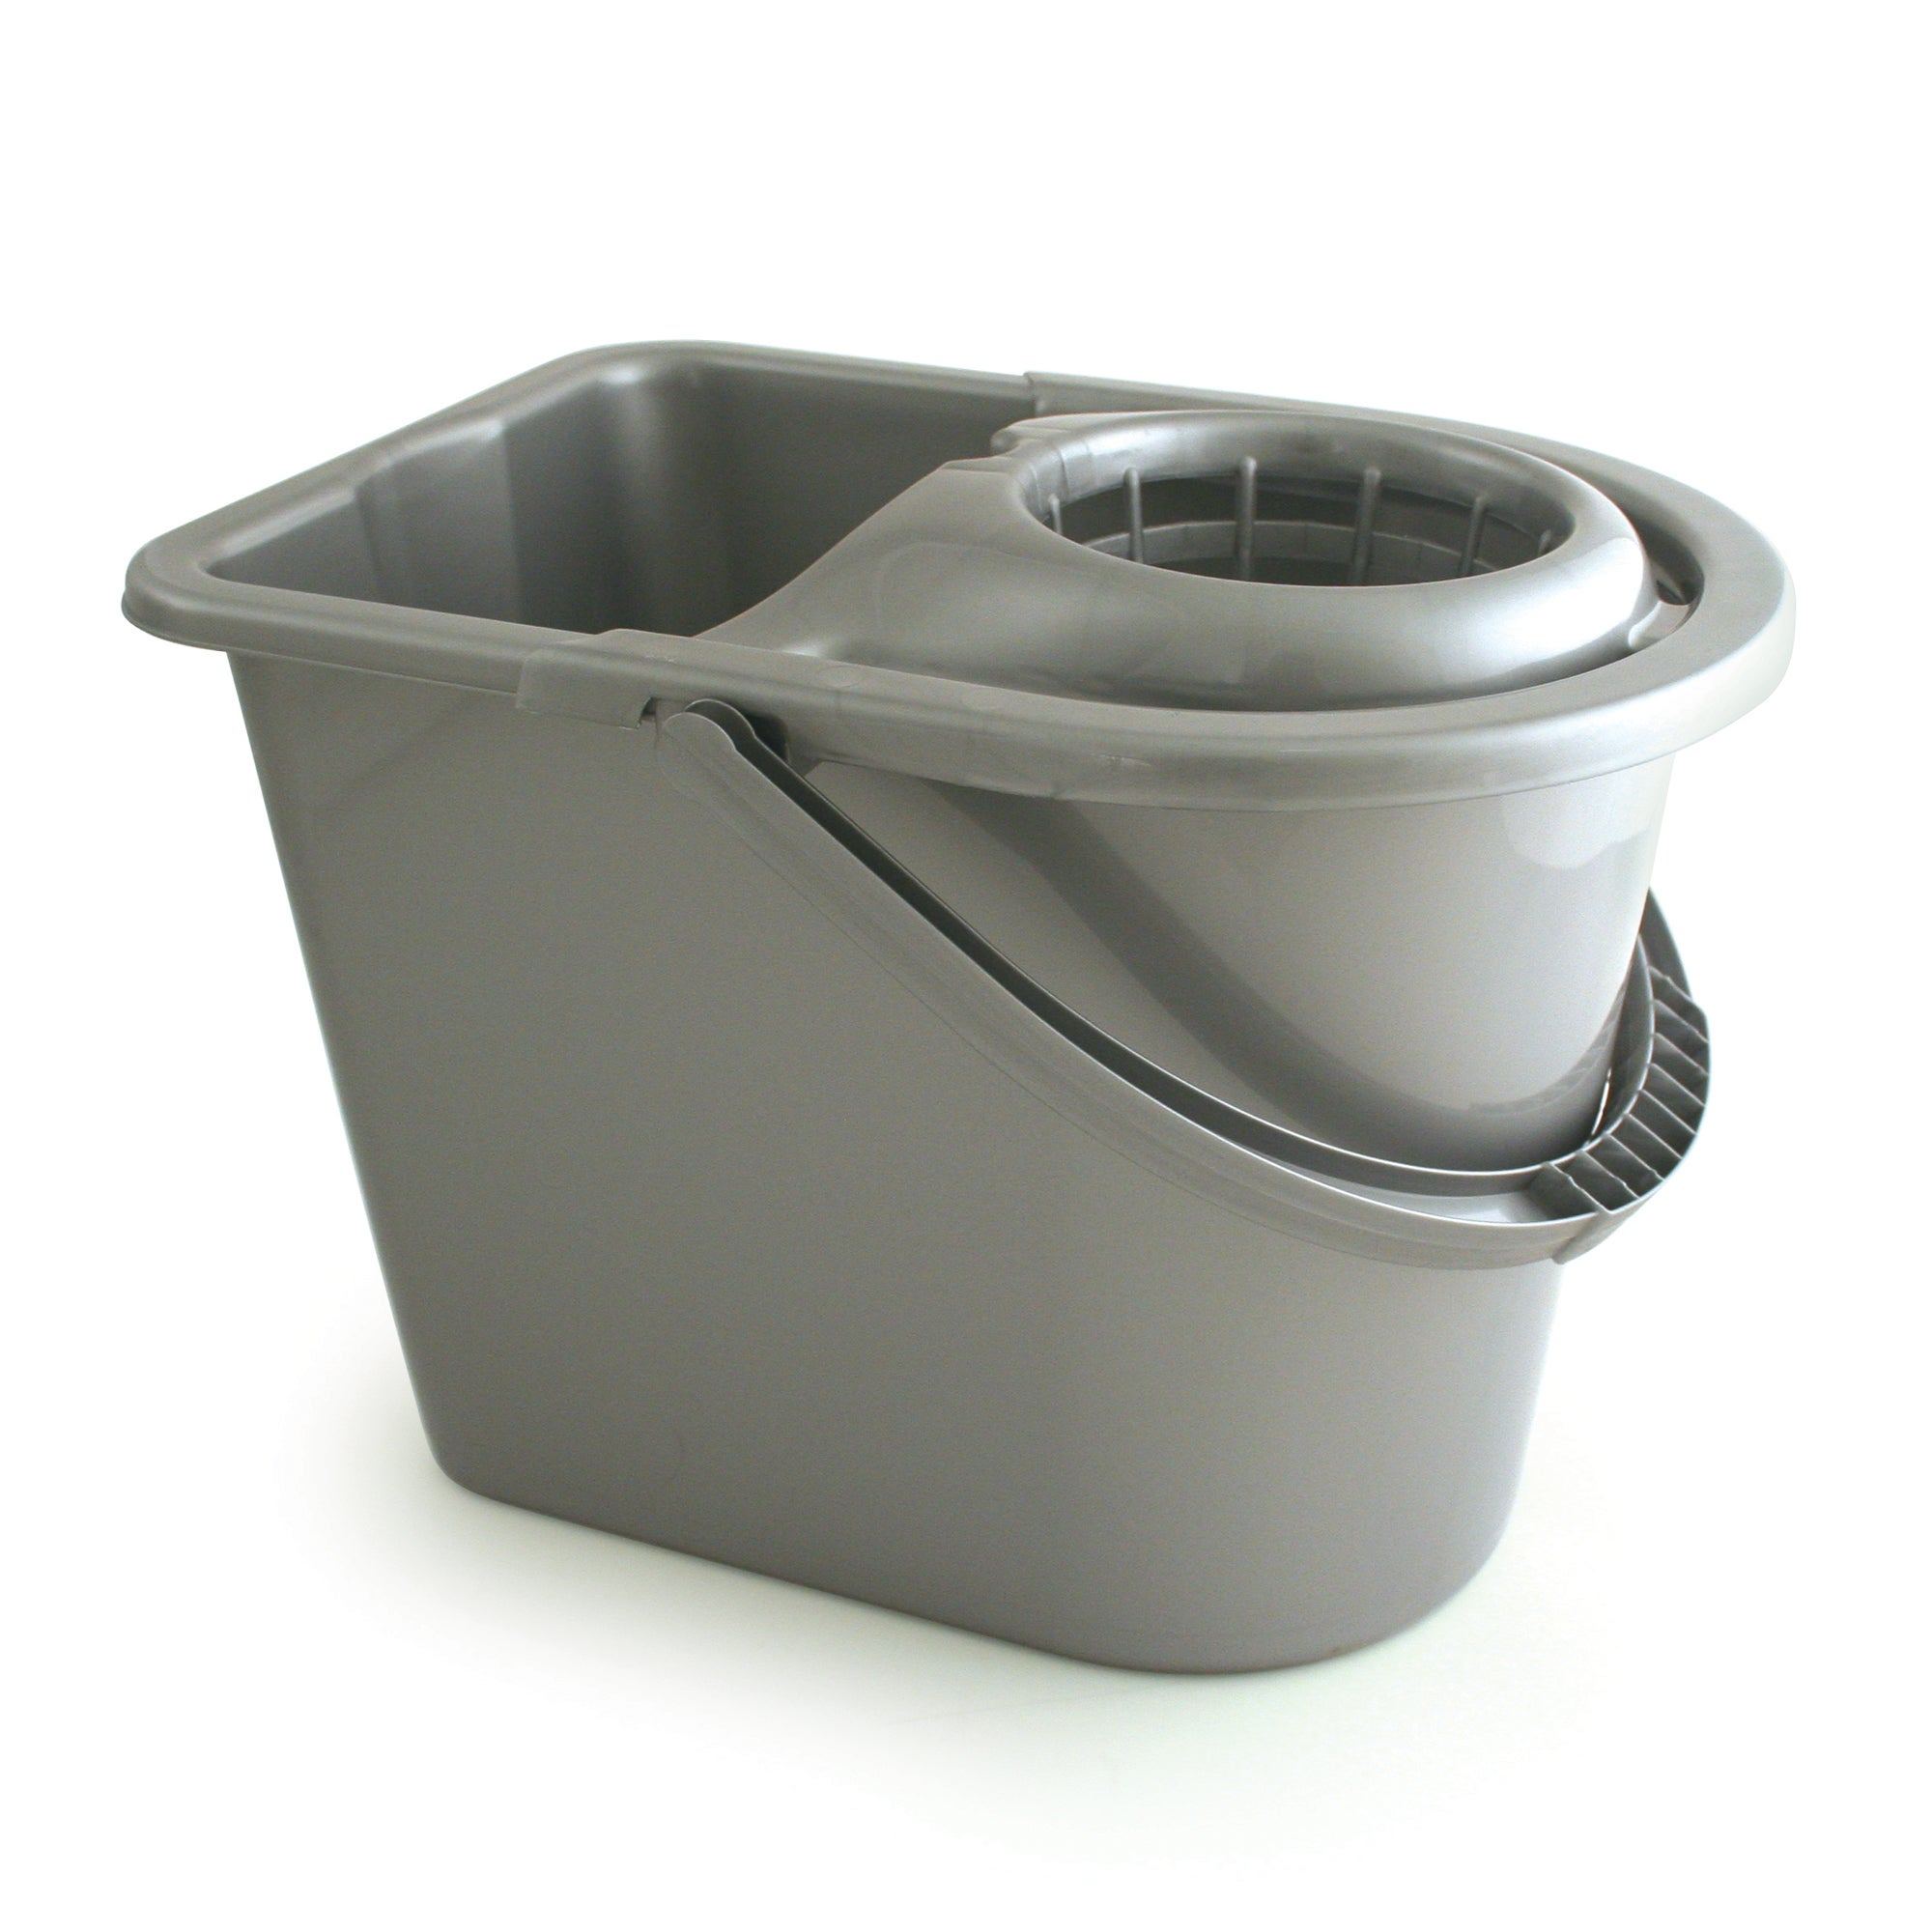 15 Litre Mop Bucket